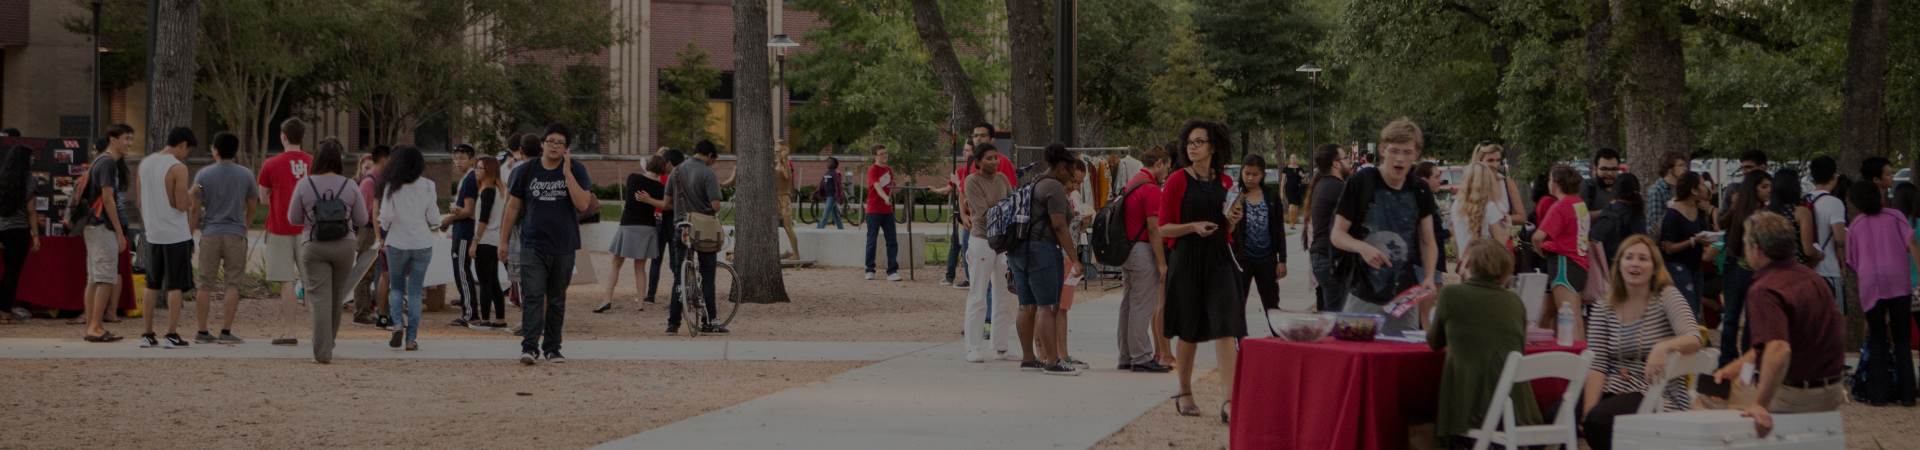 University of Houston Outdoor Event on Campus